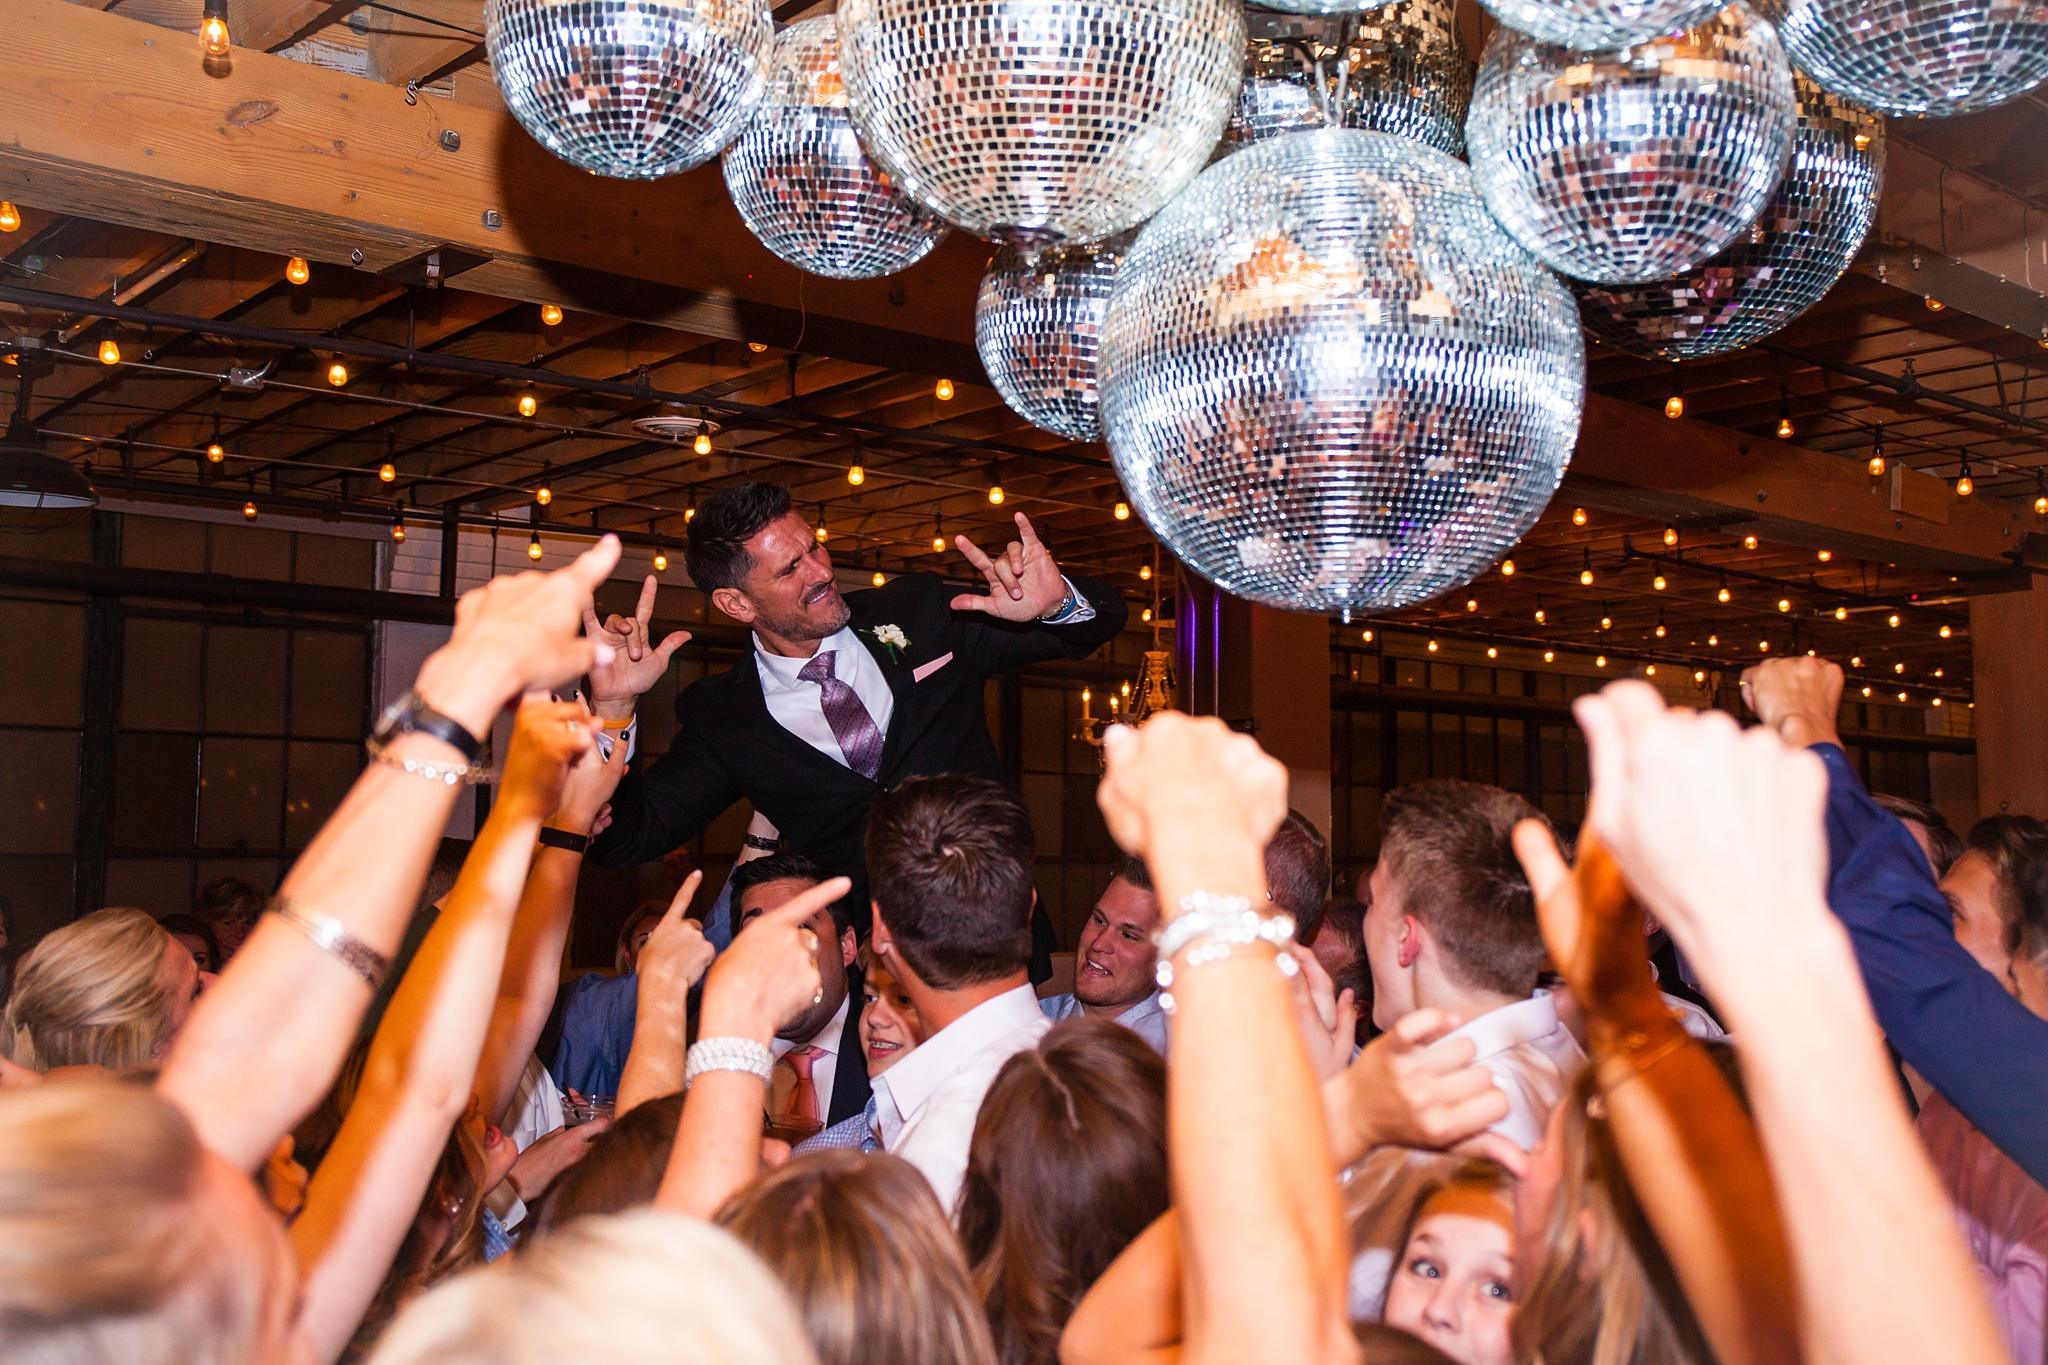 Meghan_Drew_Grand_Rapids_Cheney_place_Wedding096.JPG